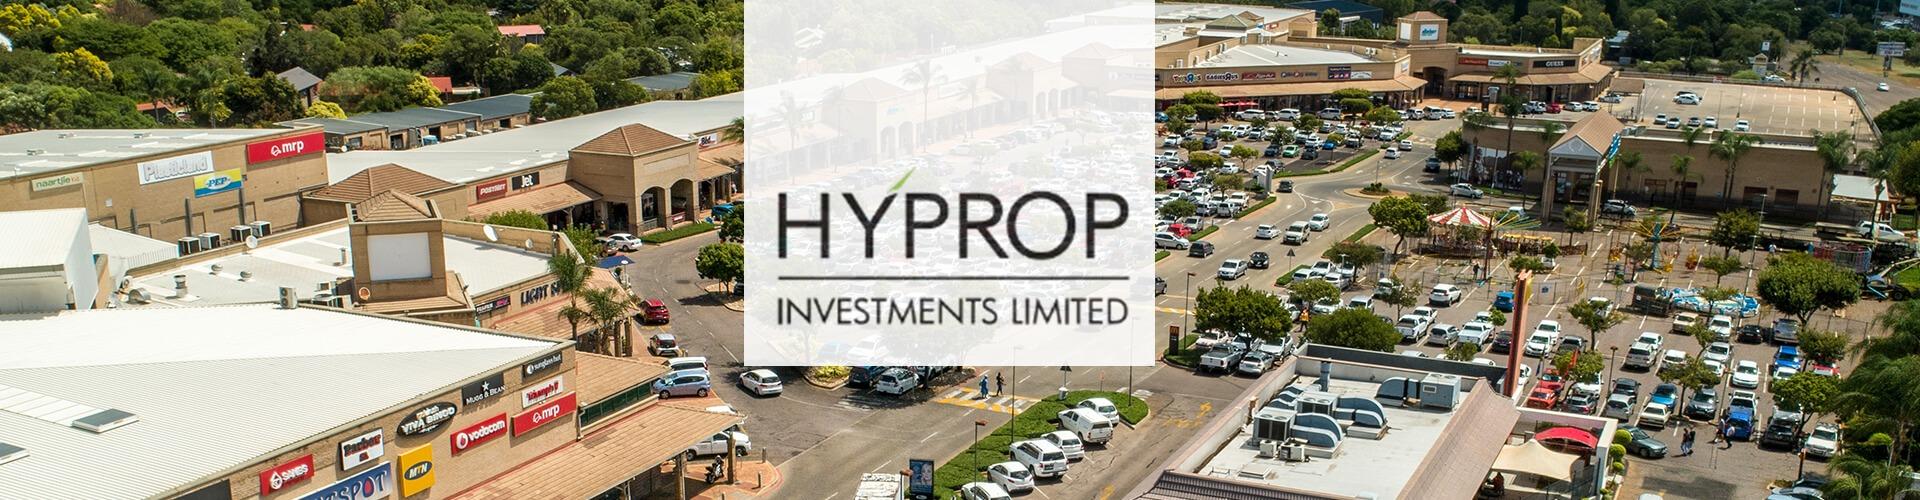 Hyprop header 08-02-21